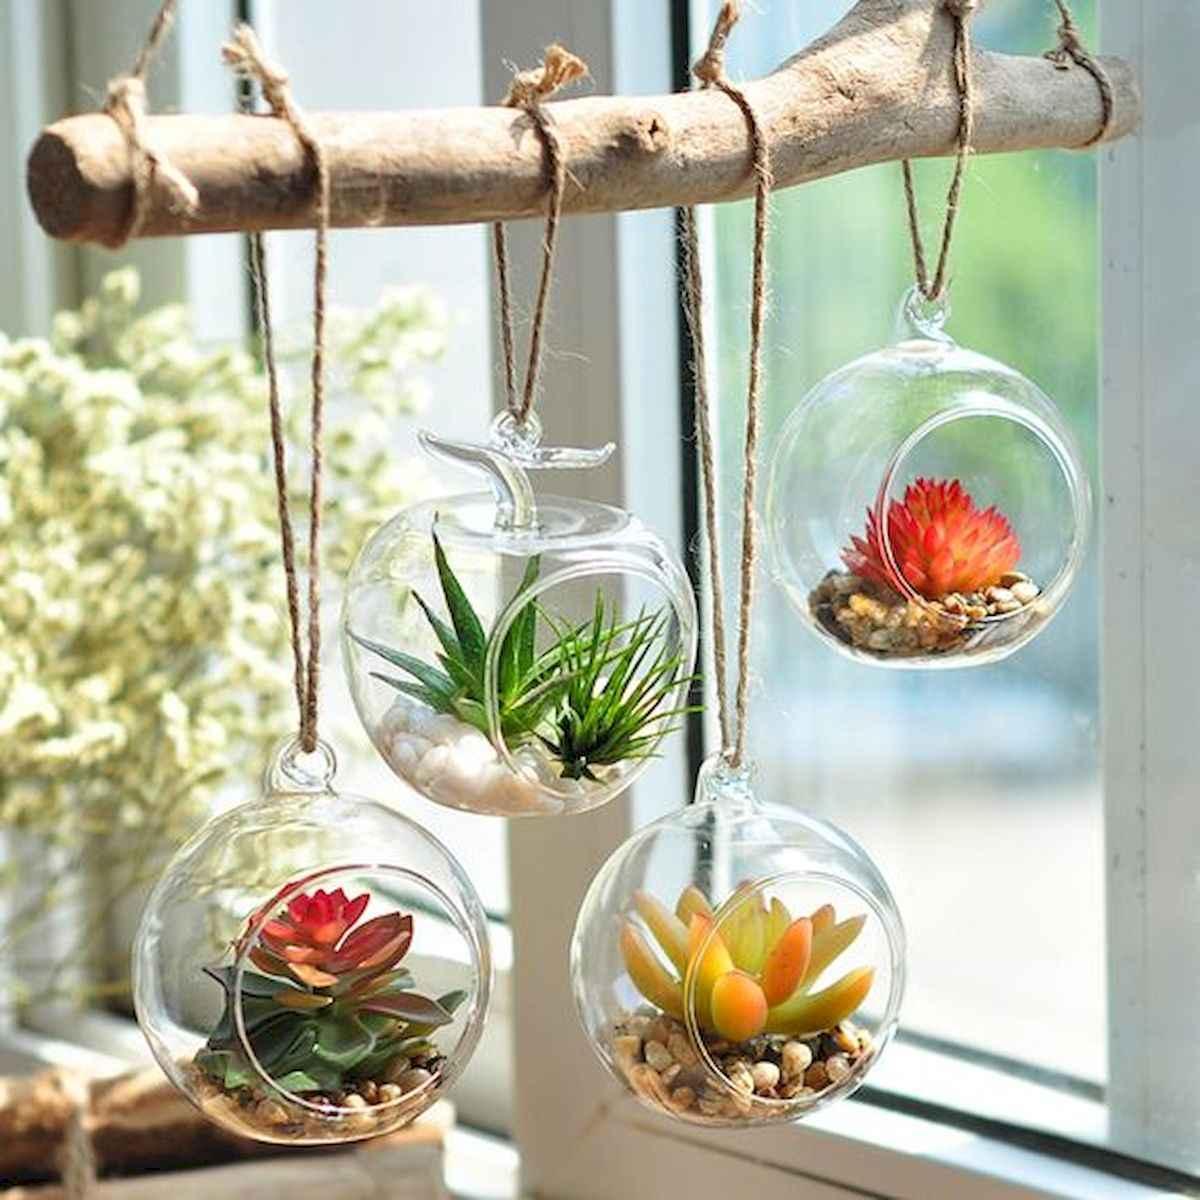 30 Amazing DIY Home Decor Dollar Store Ideas (12)